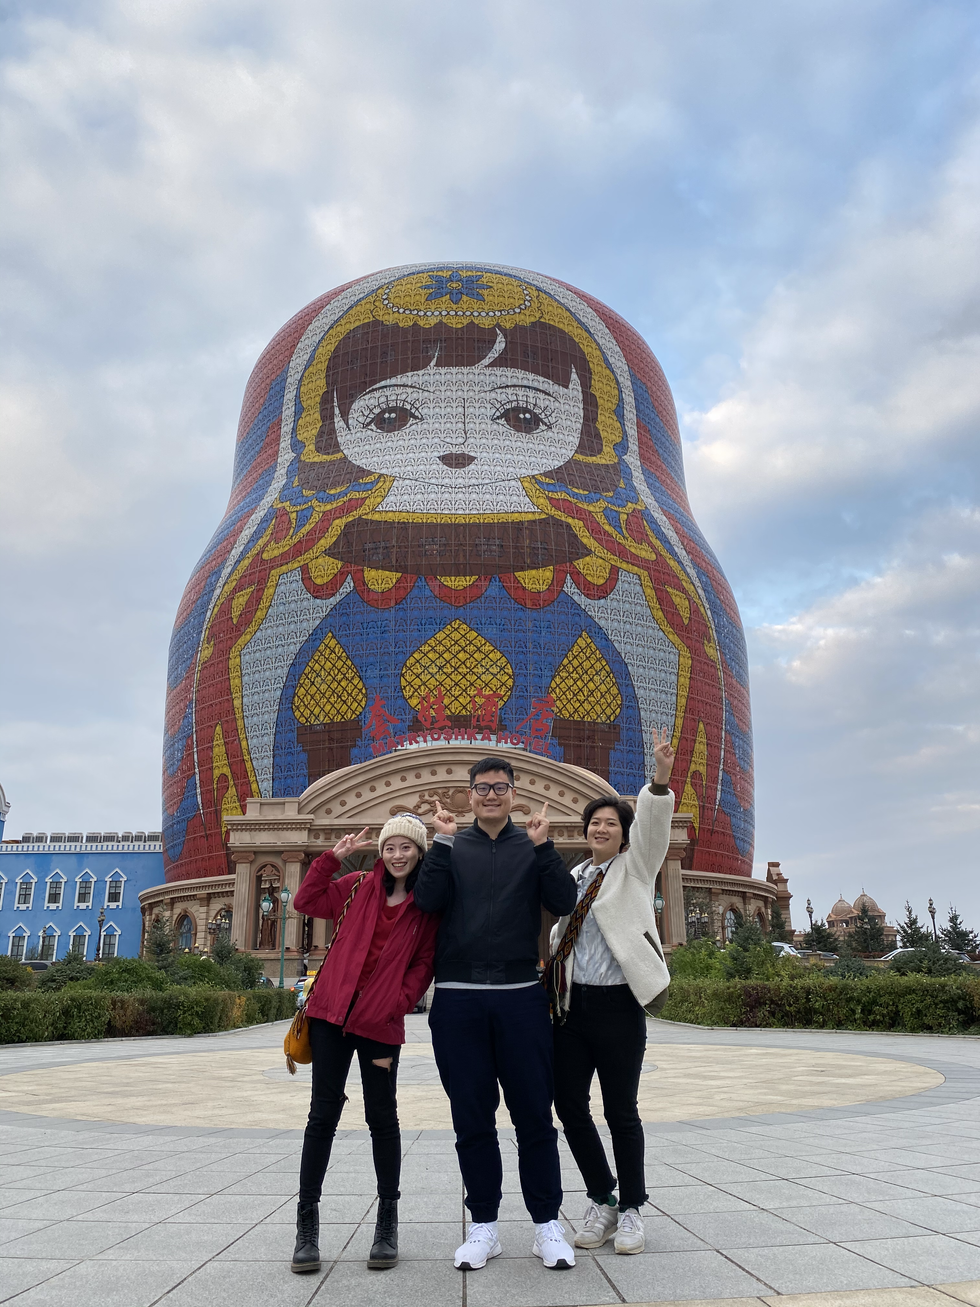 China Inner Mongolia Day1-2 中國內蒙古 第一二天行程全記錄 全世界最大的俄羅斯娃娃在這裡!